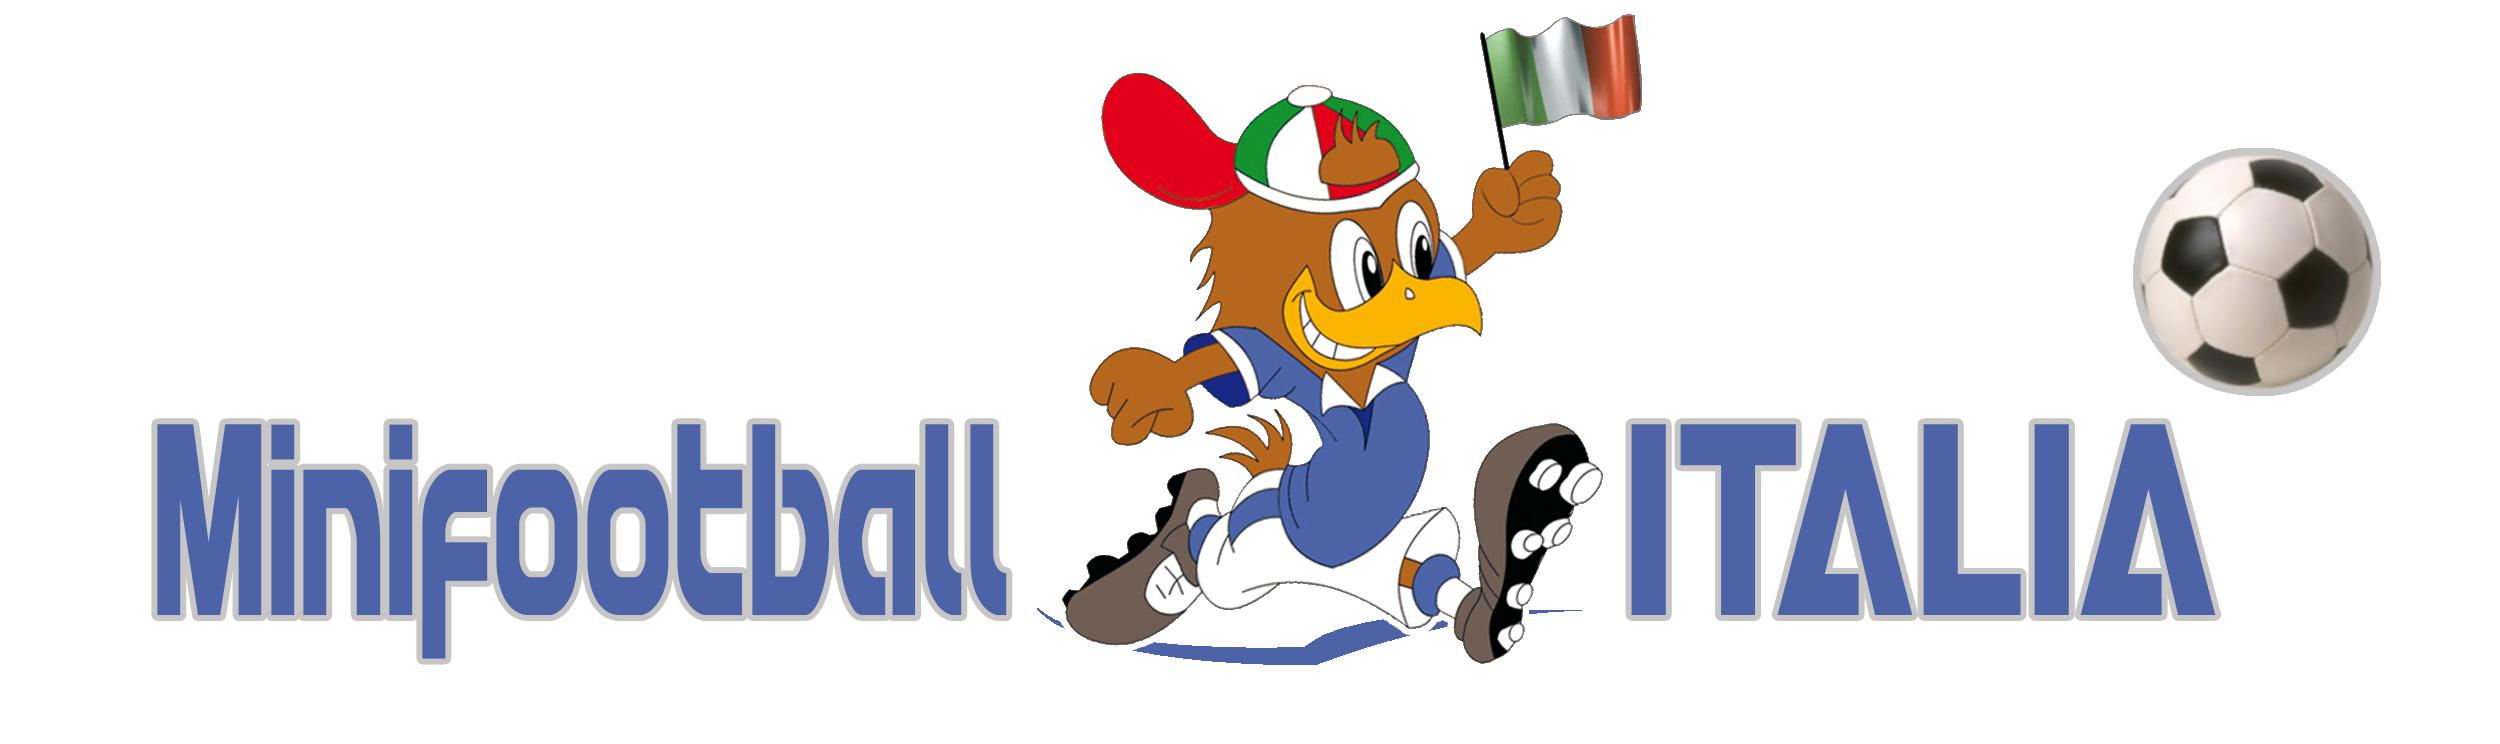 Minifootball Italia